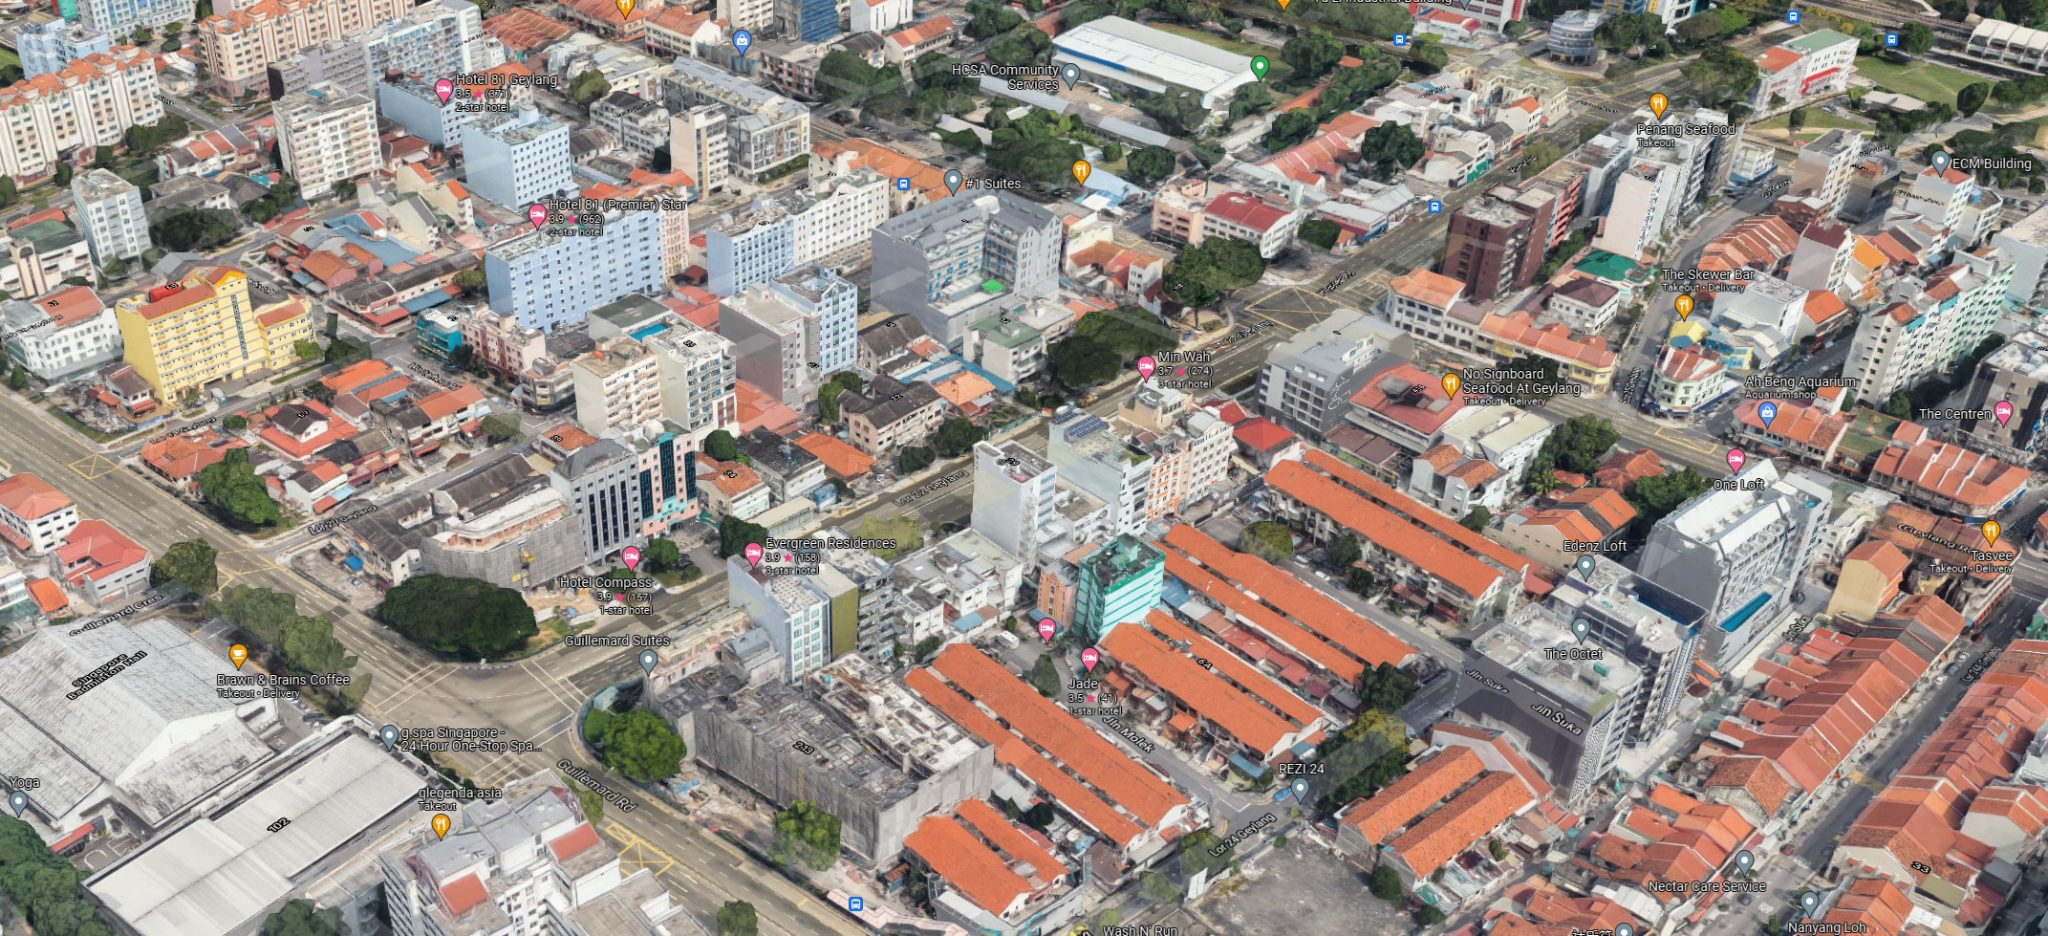 mori-condo-top-view-freehold-jalan-molek-guillemard-road-singapore